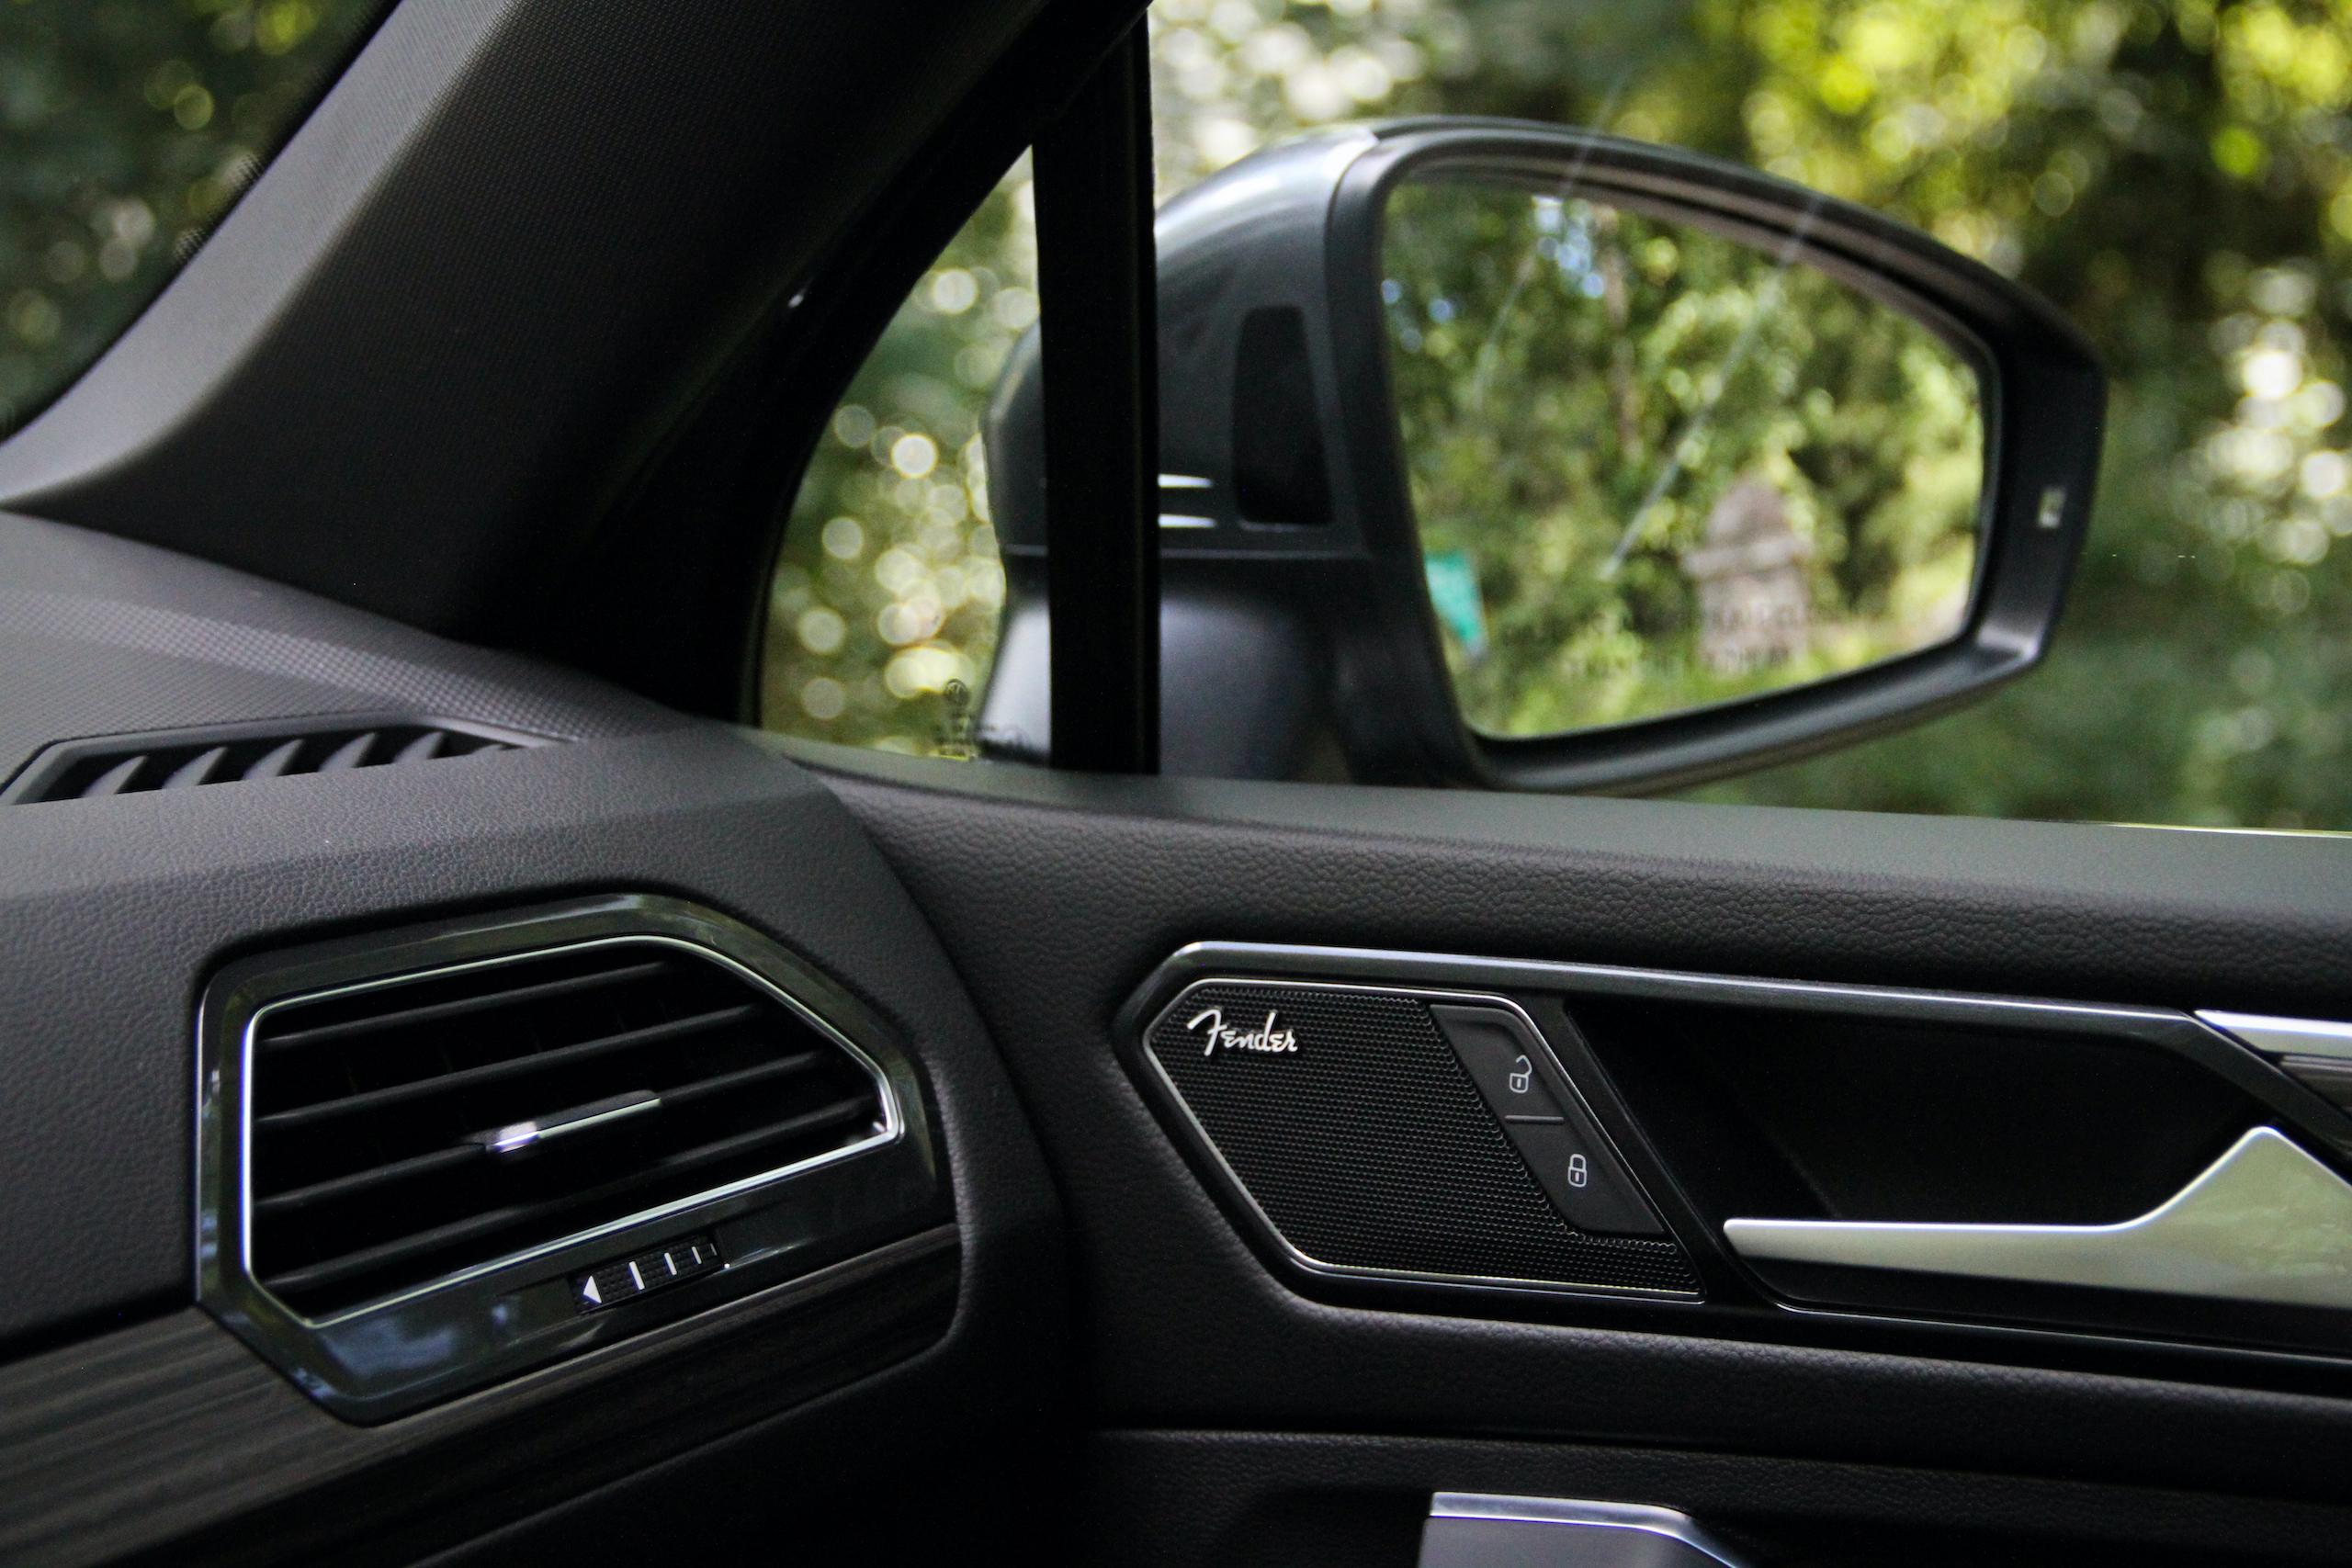 2022 VW Tiguan SEL R-Line interior trim materials